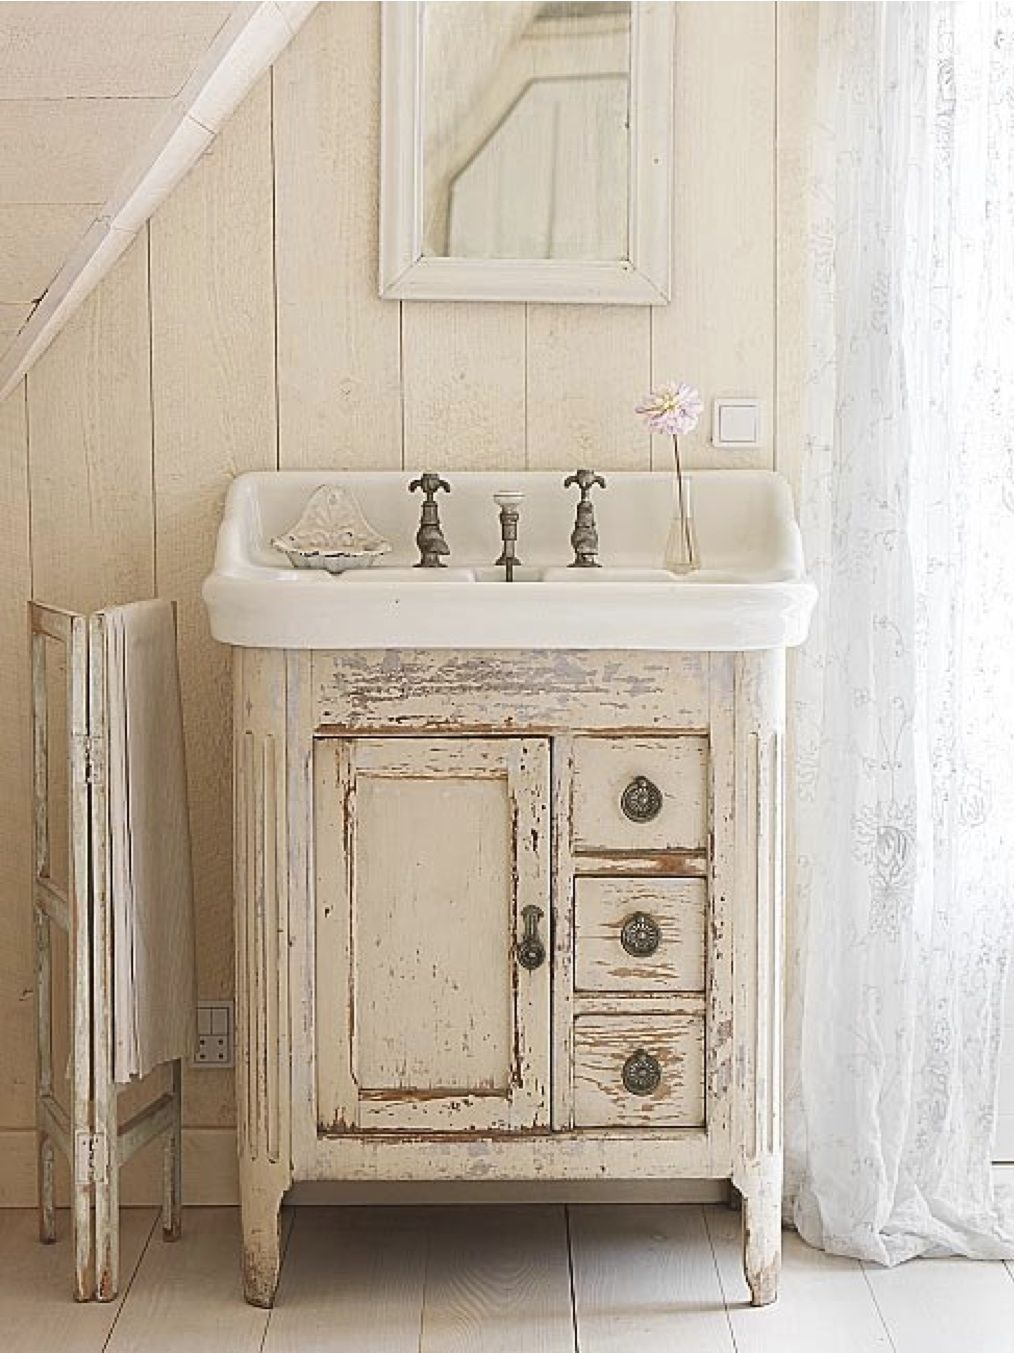 Shabby Chic Bathroom Cabinets Shabby Chic Bathroom Vanity Shabby Chic Bathroom Shabby Chic Bathroom Decor [ 1024 x 891 Pixel ]